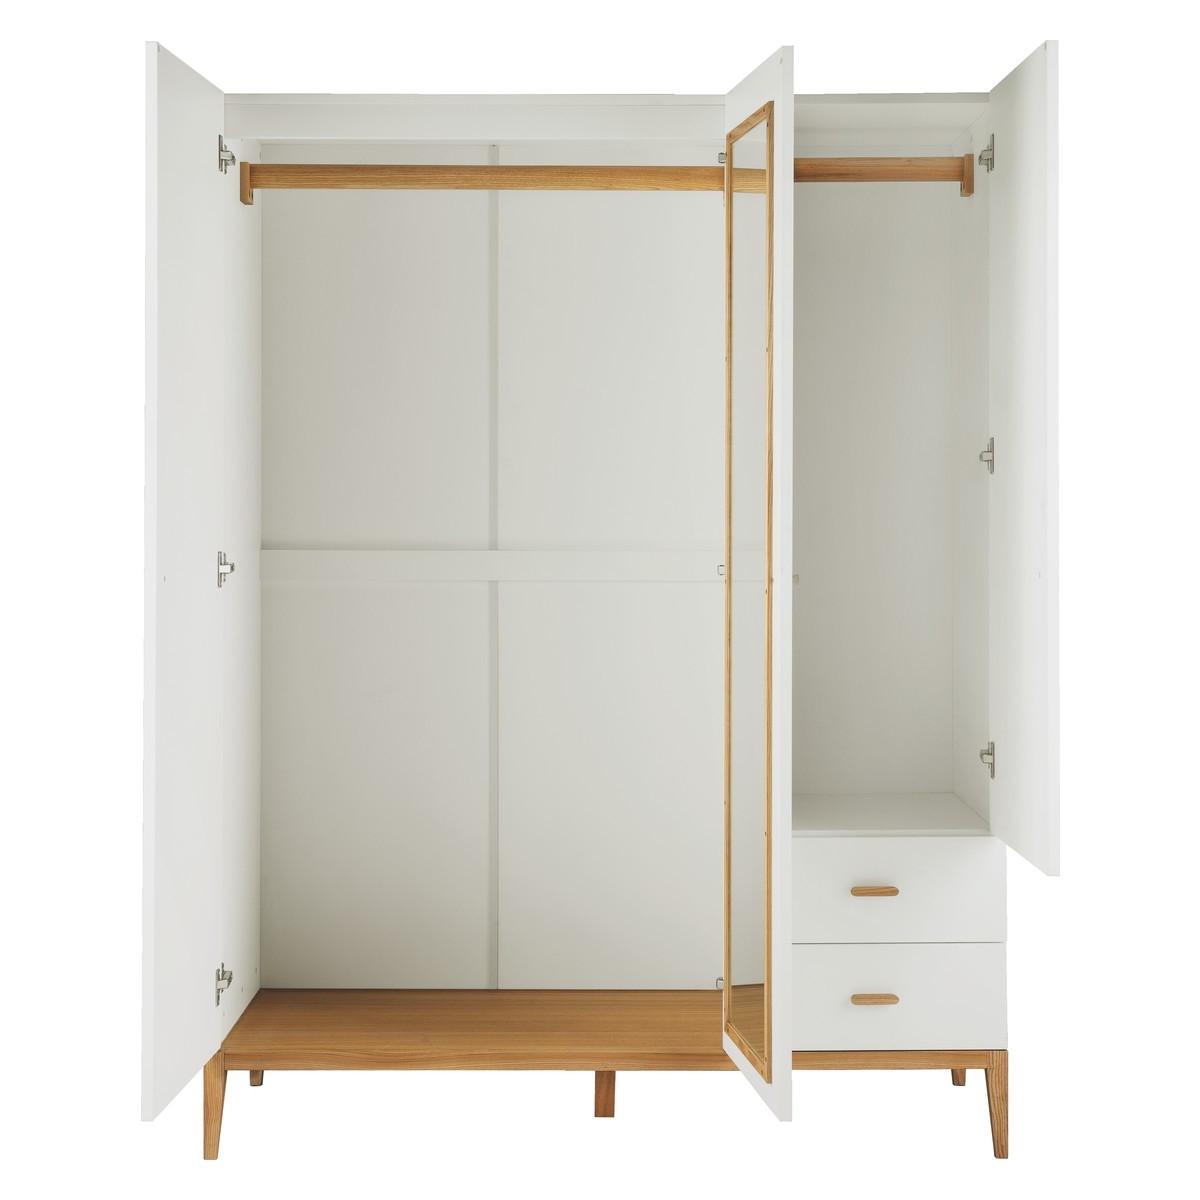 Tatsuma White And Ash 3 Door Wardrobe Buy Now At Habitat Uk With Regard To 3 Door White Wardrobes (View 2 of 25)